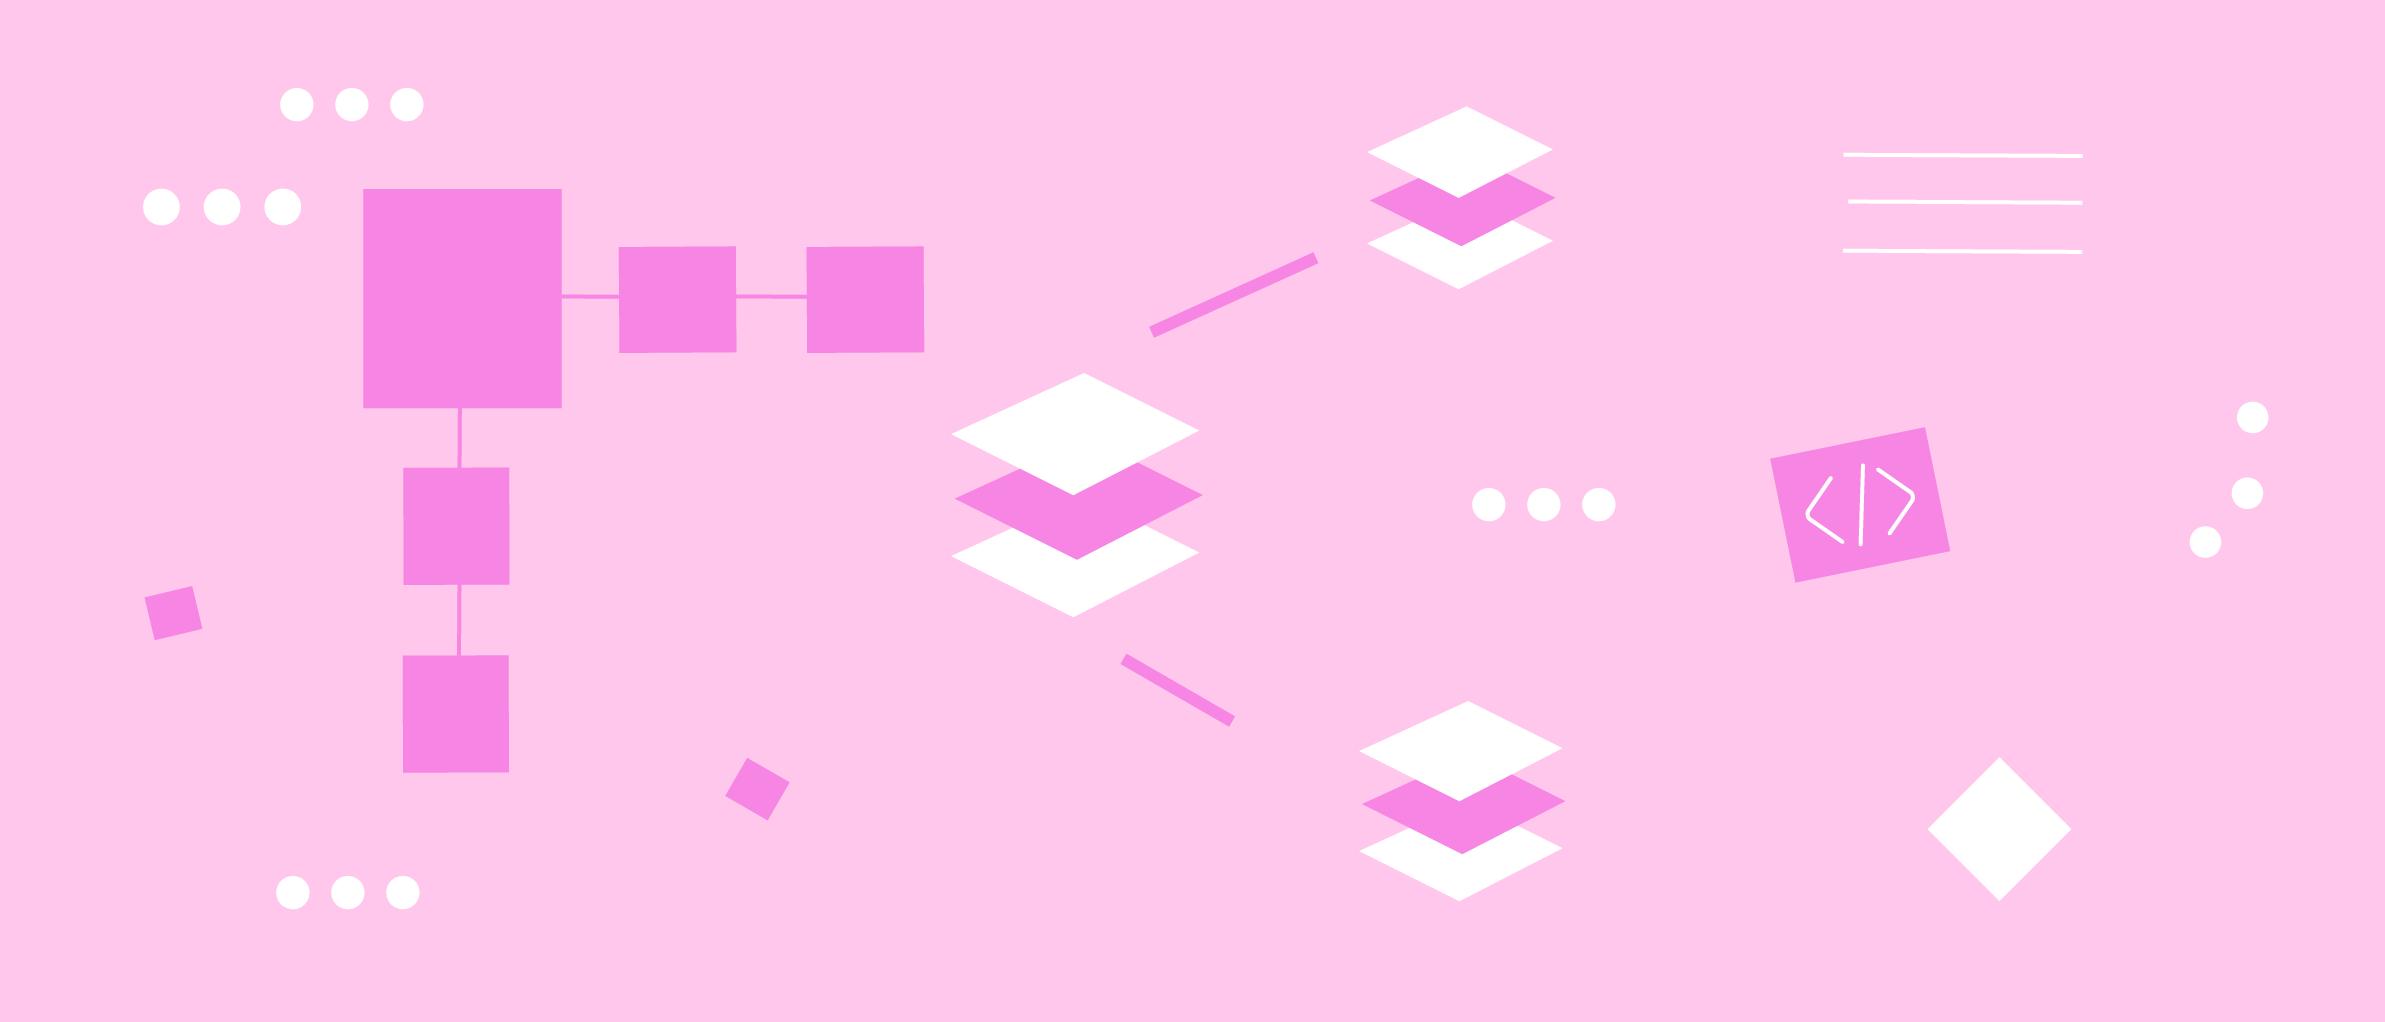 tray-resourcetile-apistack-pink@4x